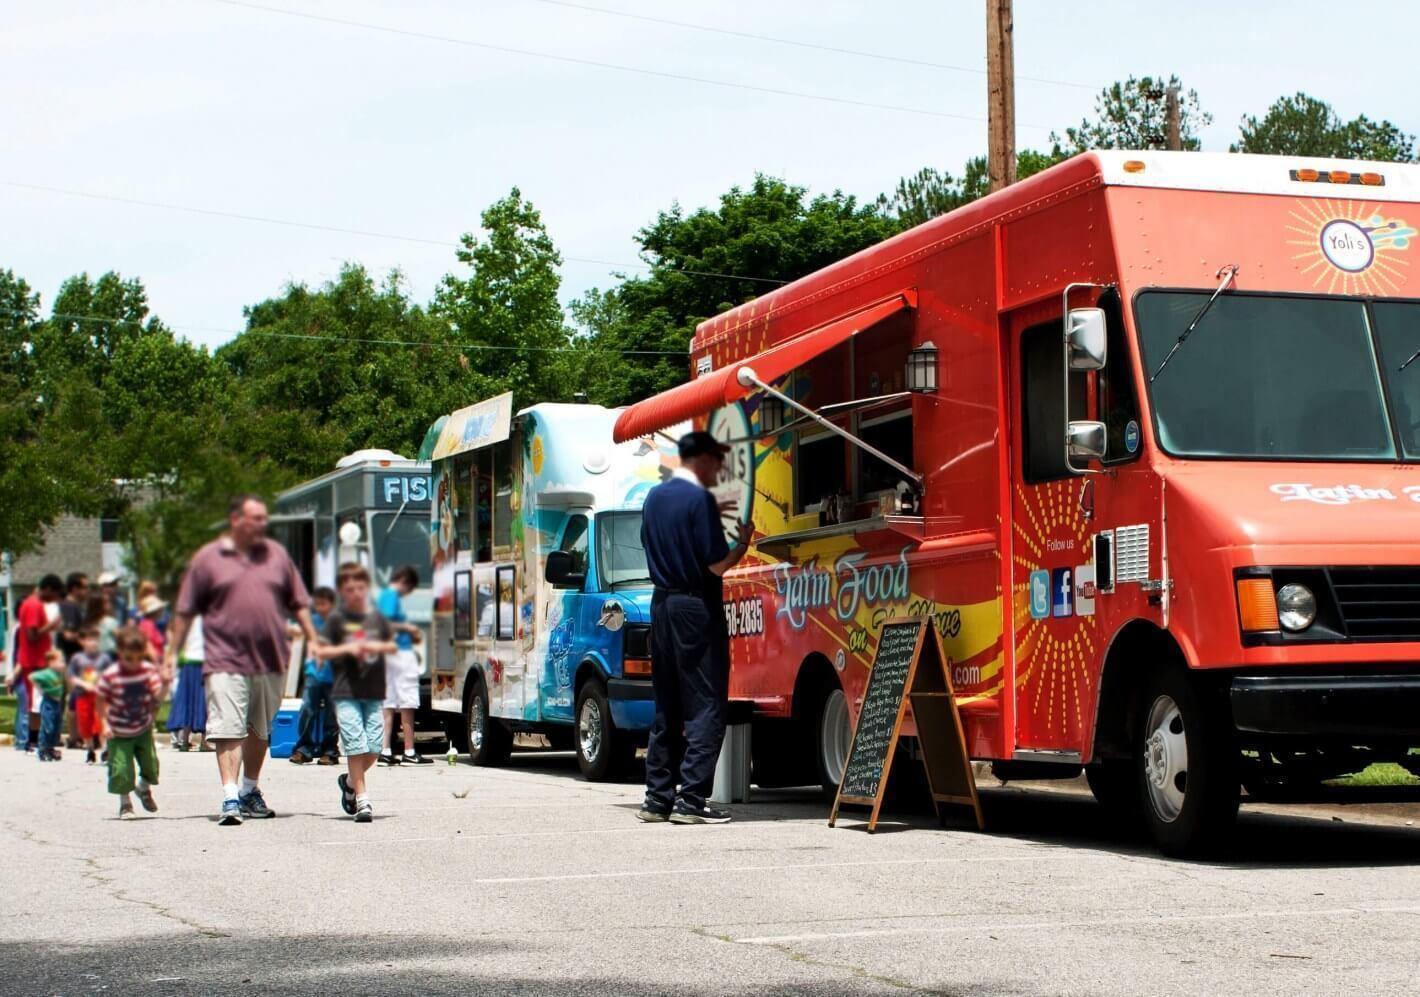 Meilleurs camions de bouffe de rue (Food Trucks) à Montréal